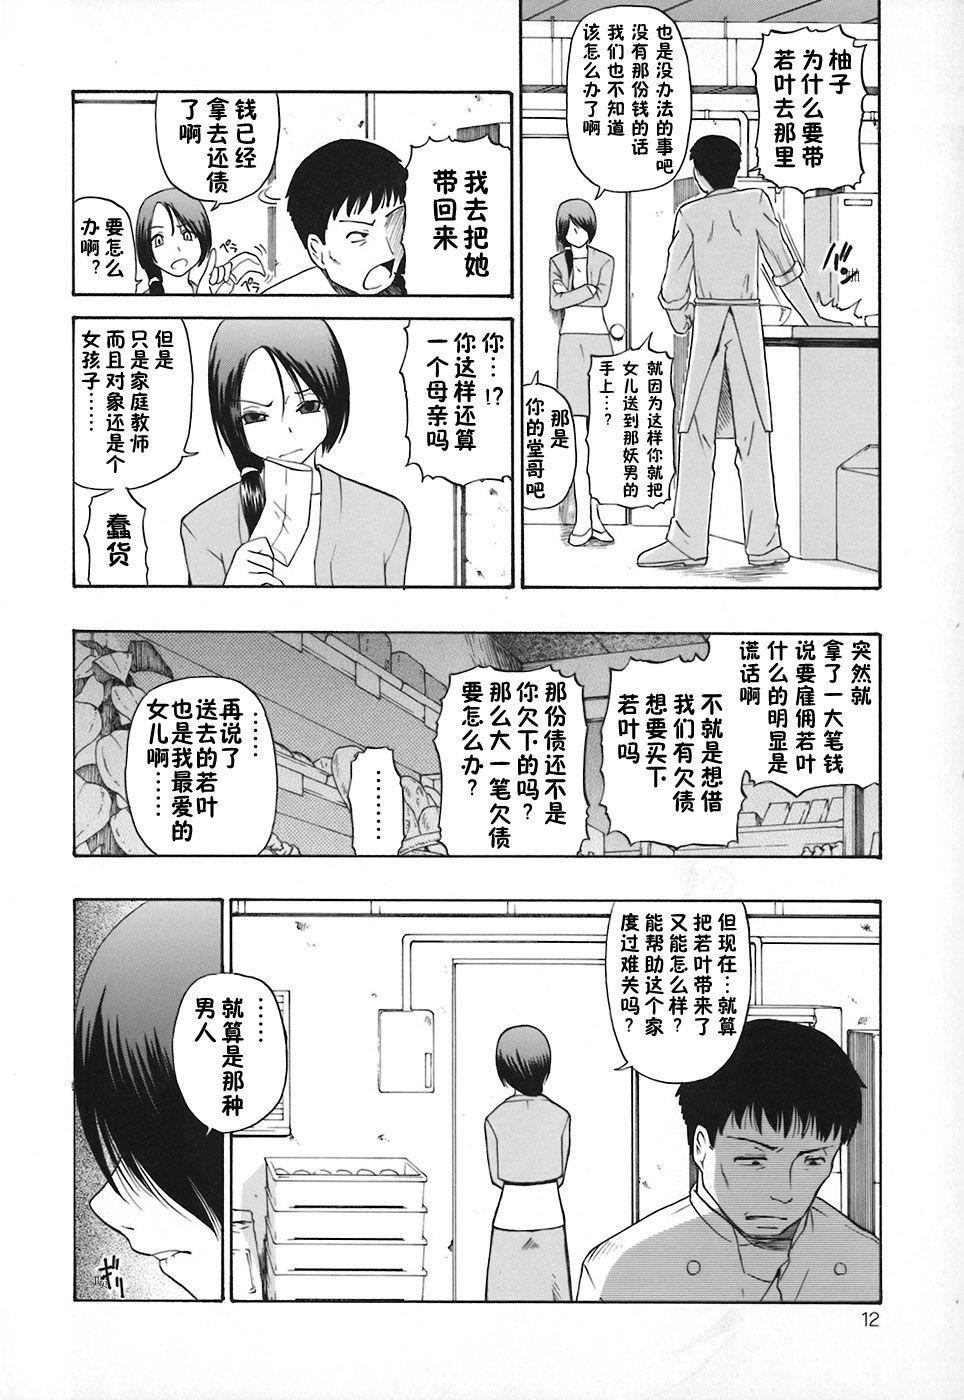 Akutoku no Sakae - Prosperites du Vice 13